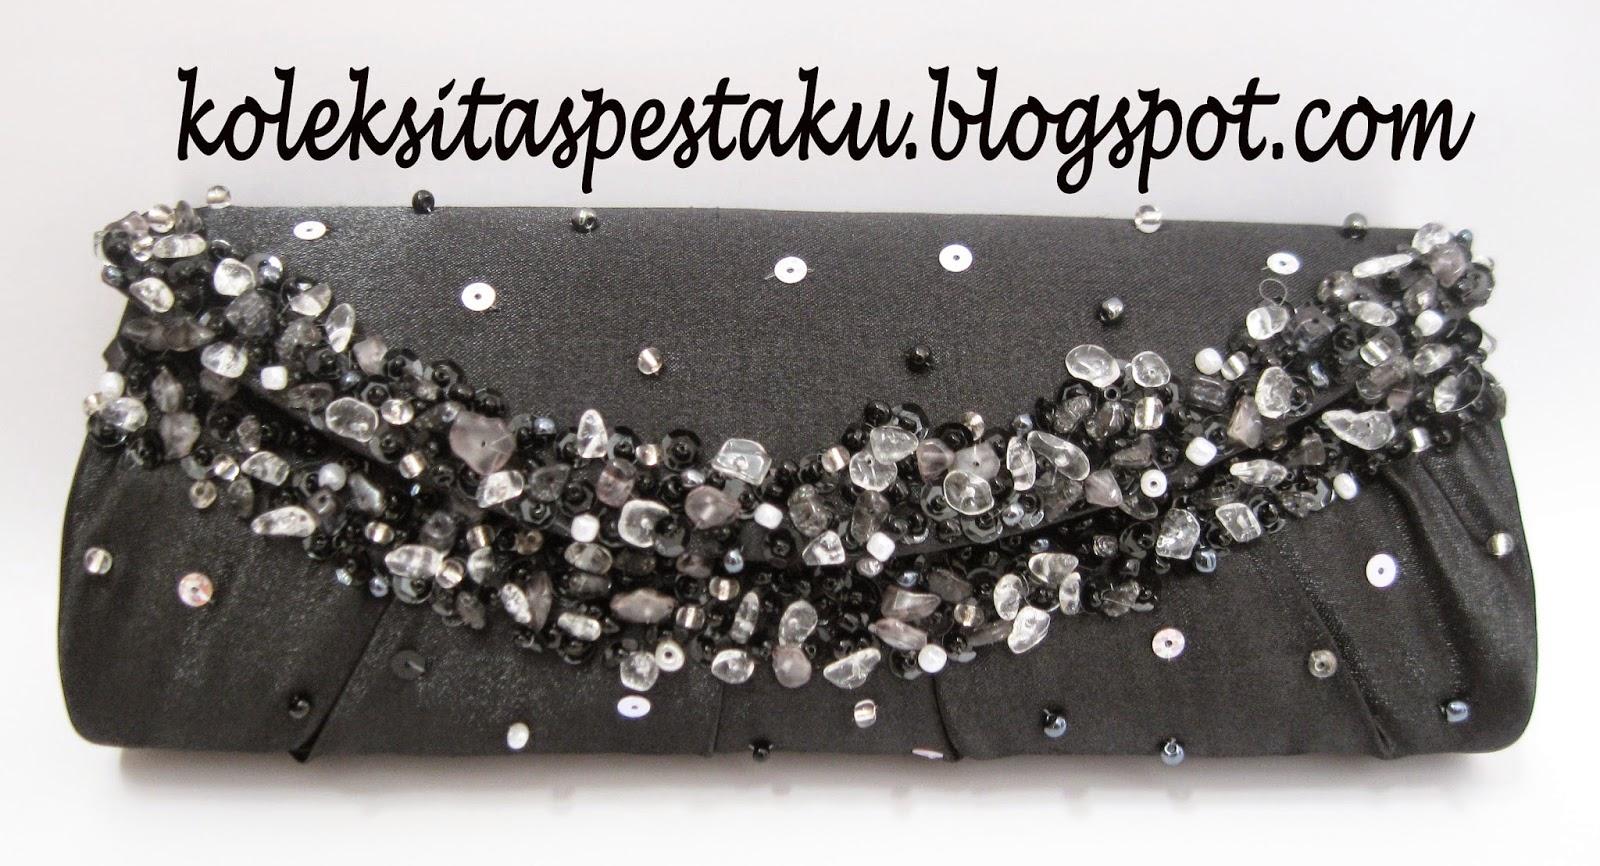 Tas Pesta Model Terbaru Ready Stock Mewah dan ANggun Cantik. TAS PESTA - CLUTCH  BAG ... 91e1a8b495